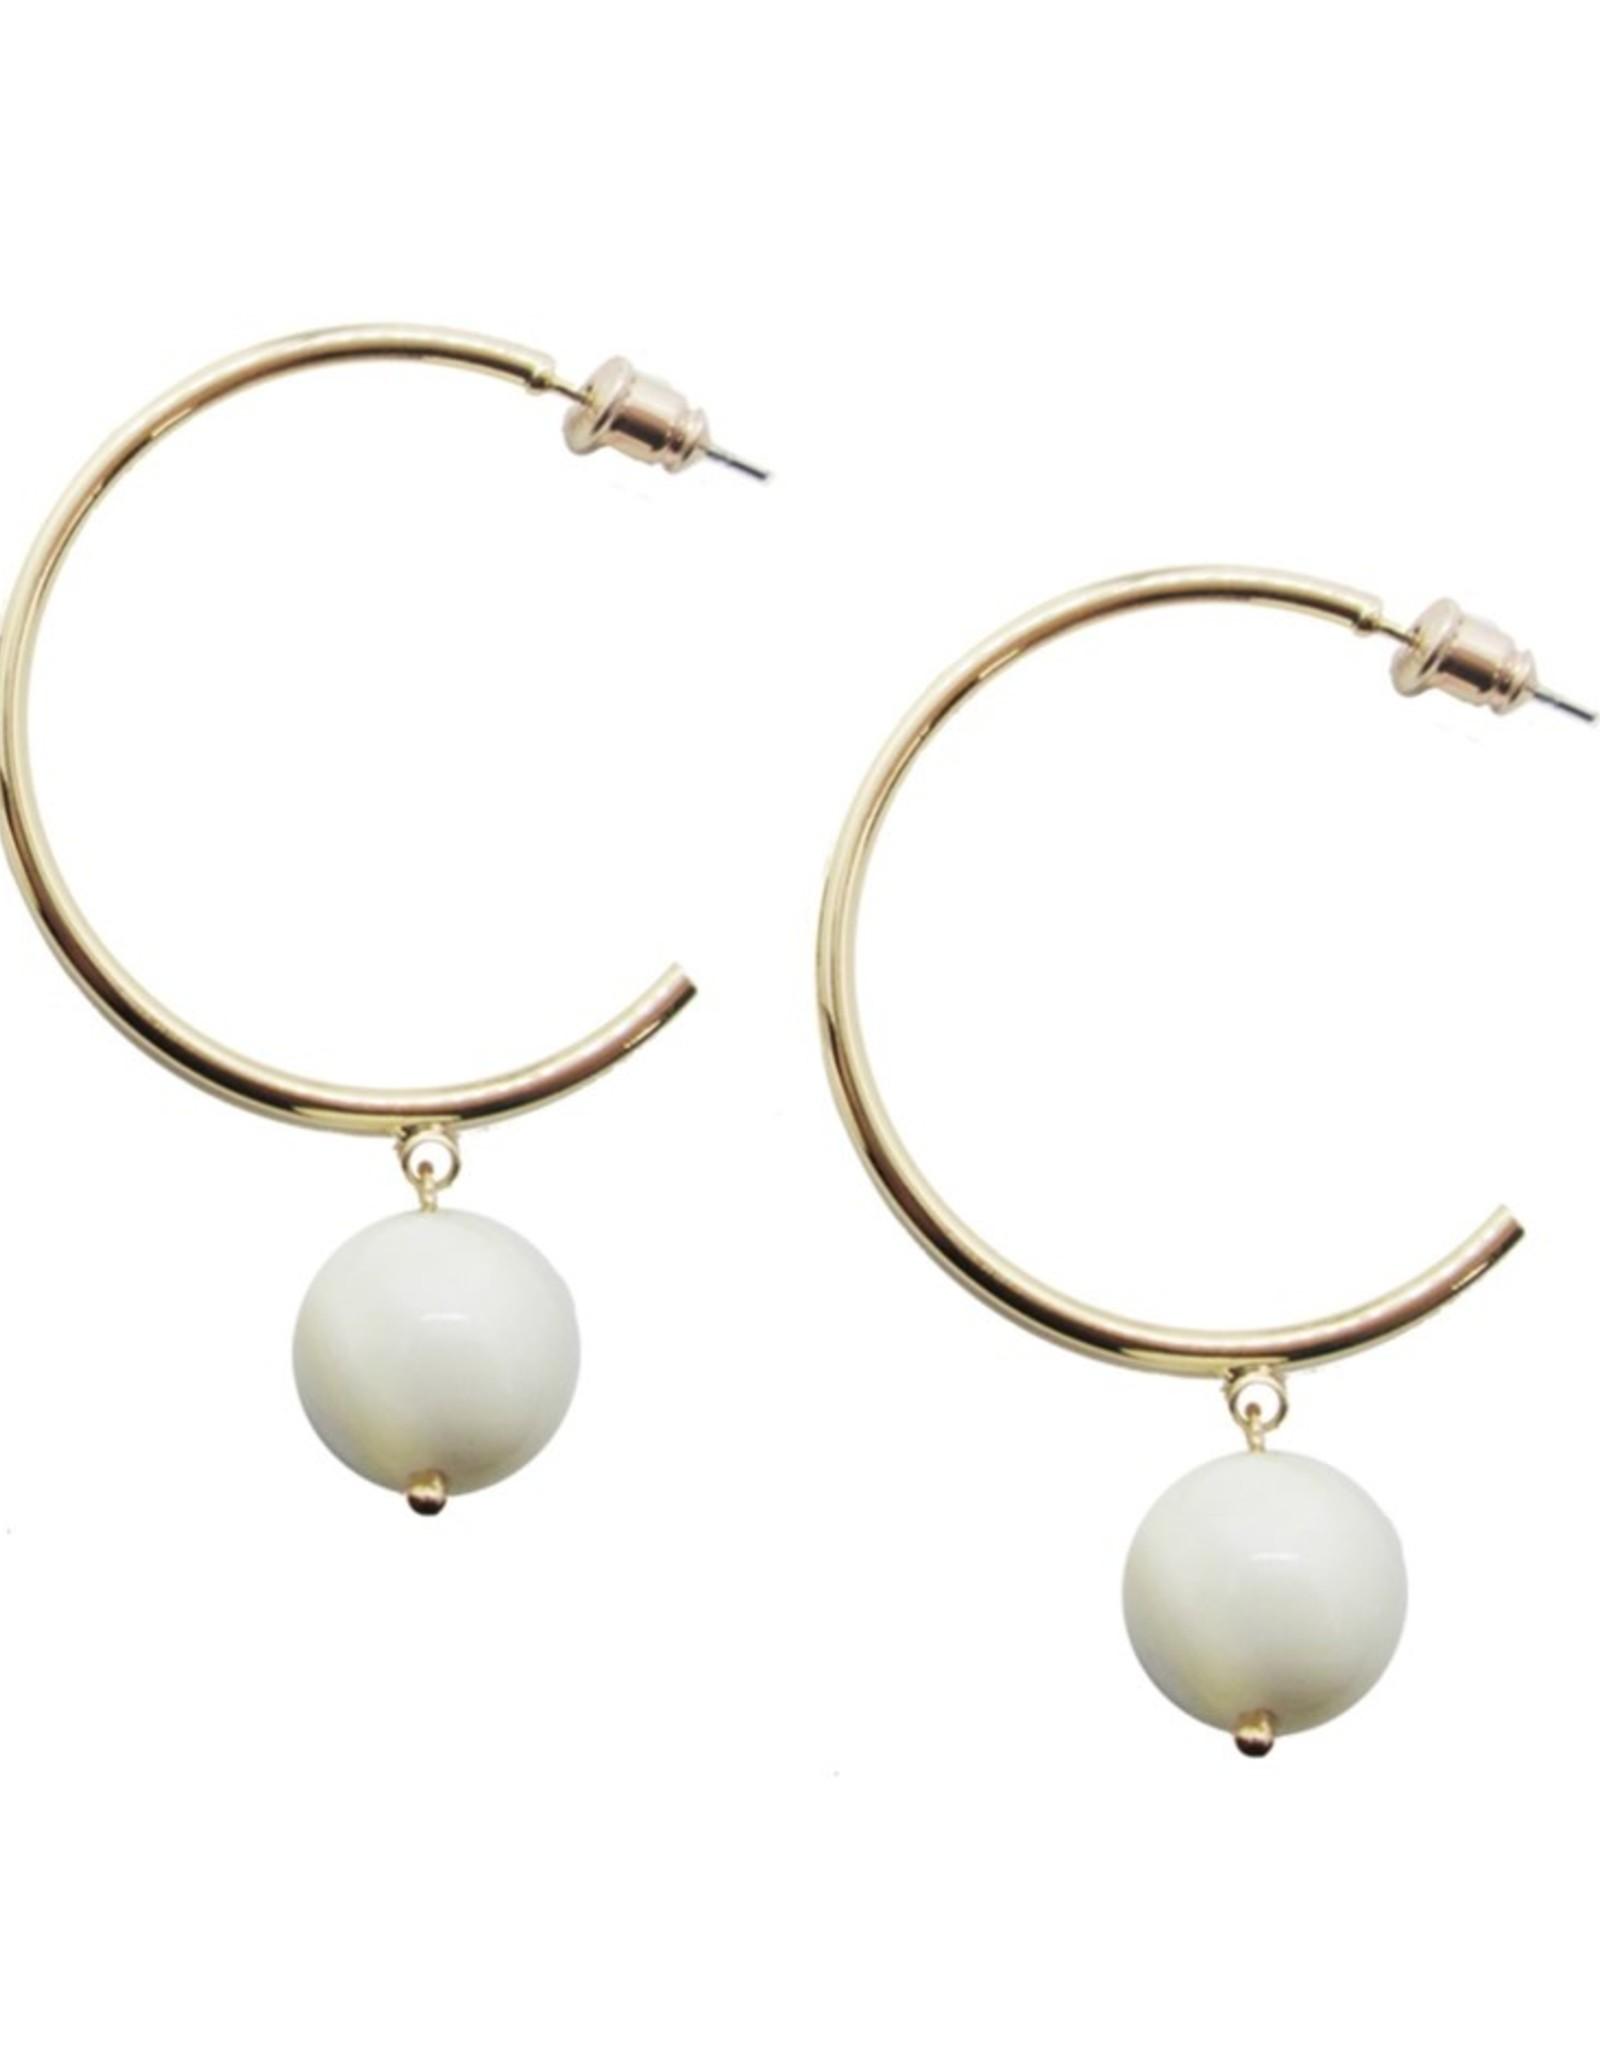 White & Gold Hoop Earrings